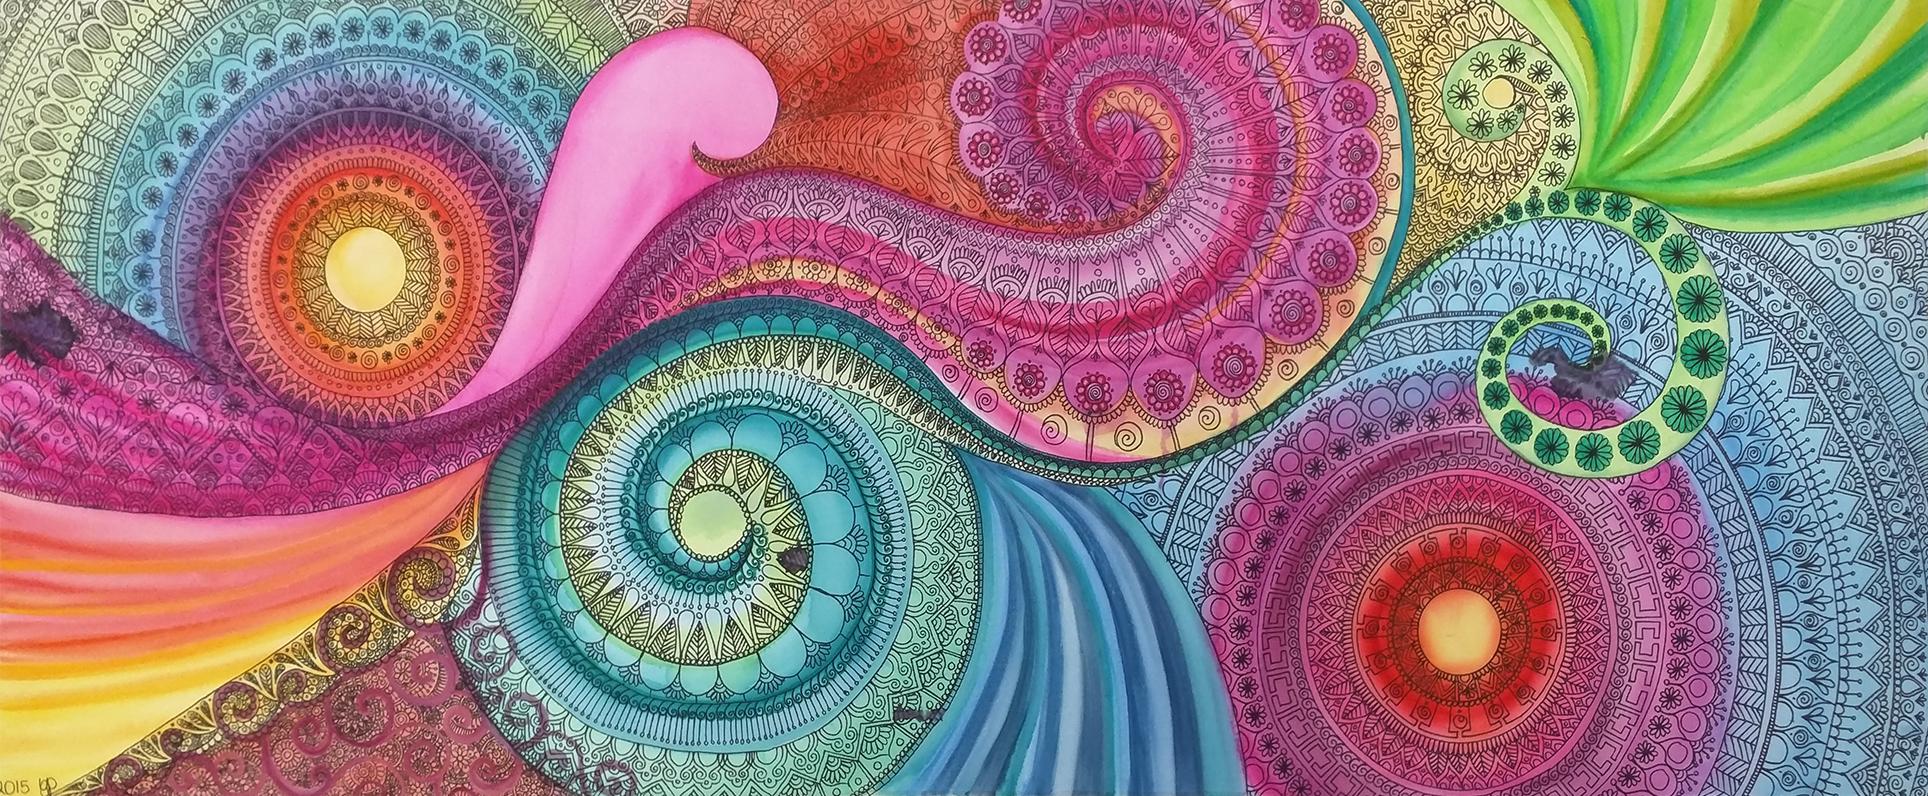 Dream - Yasmin Pringle